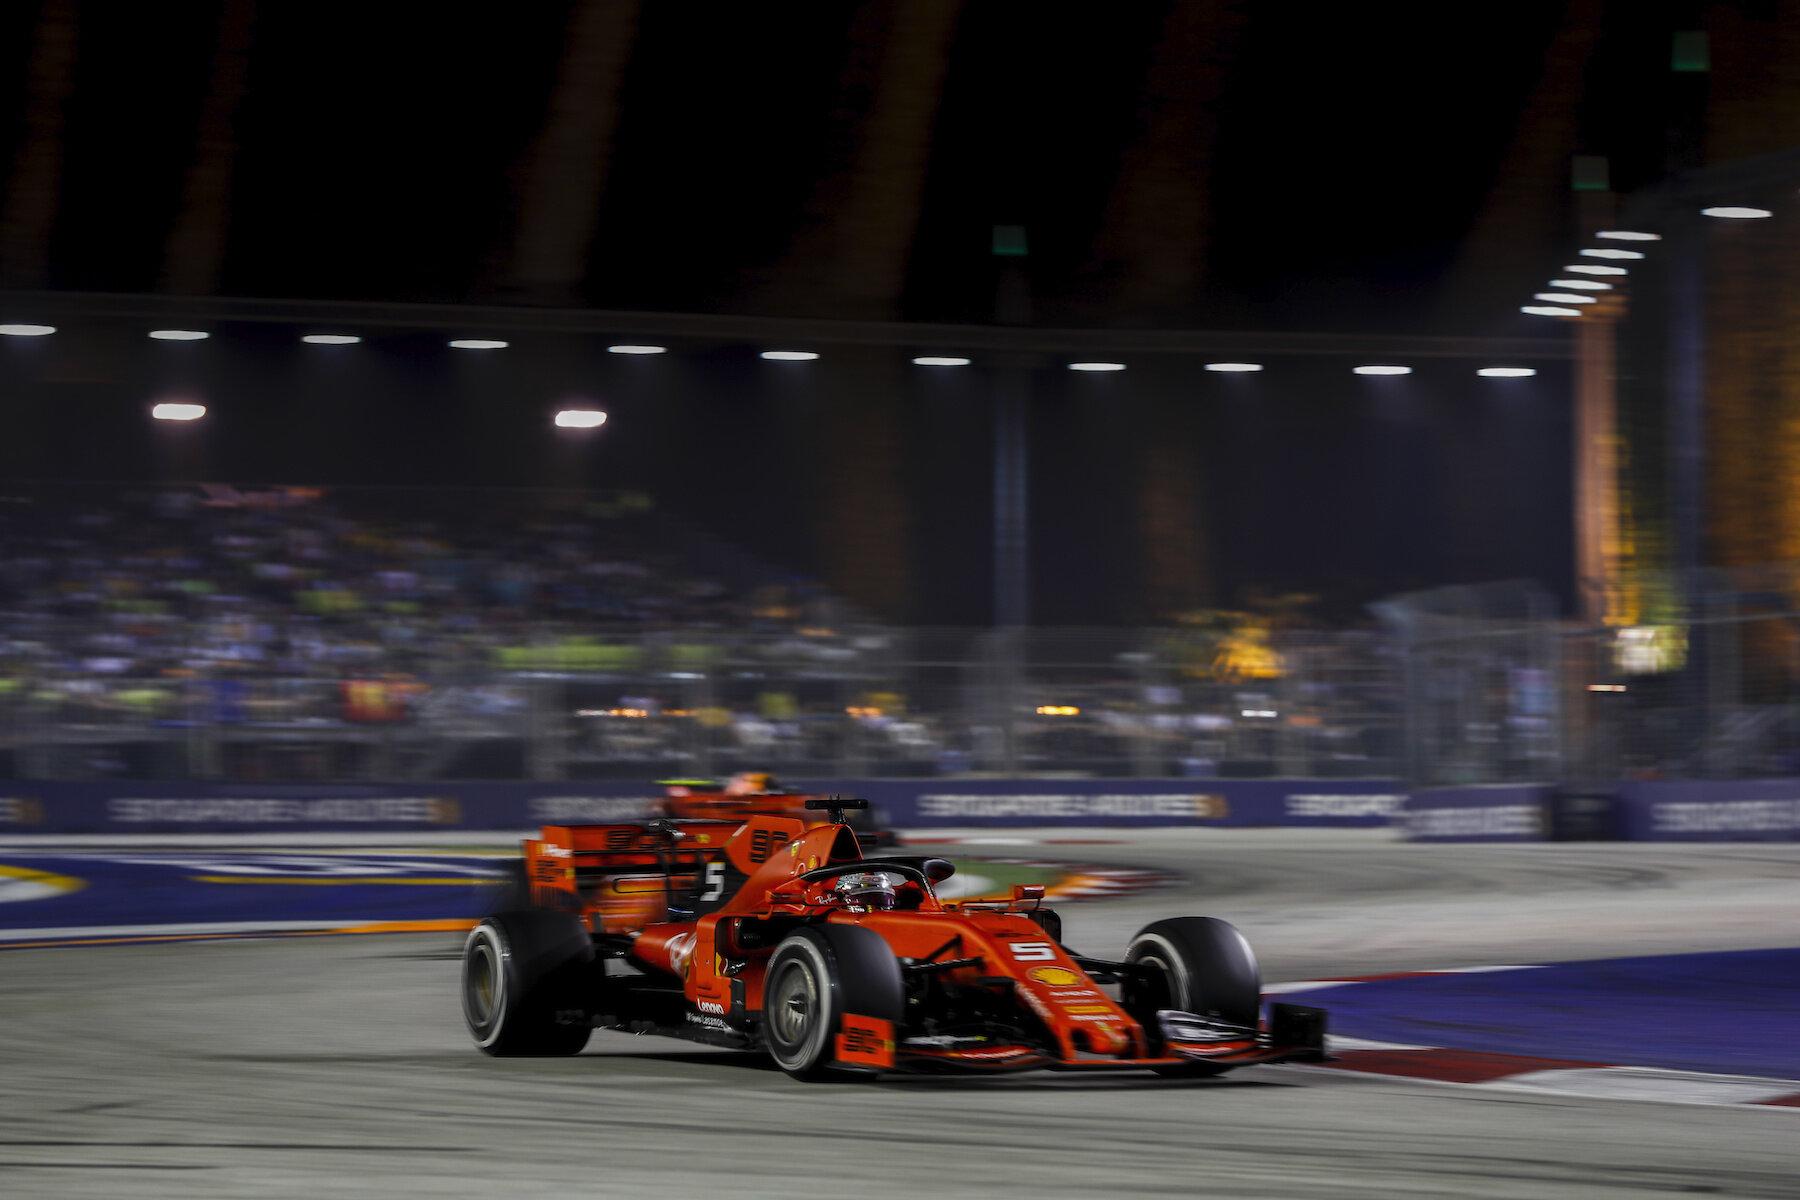 5 2019 Singapore GP Sunday 23.jpeg